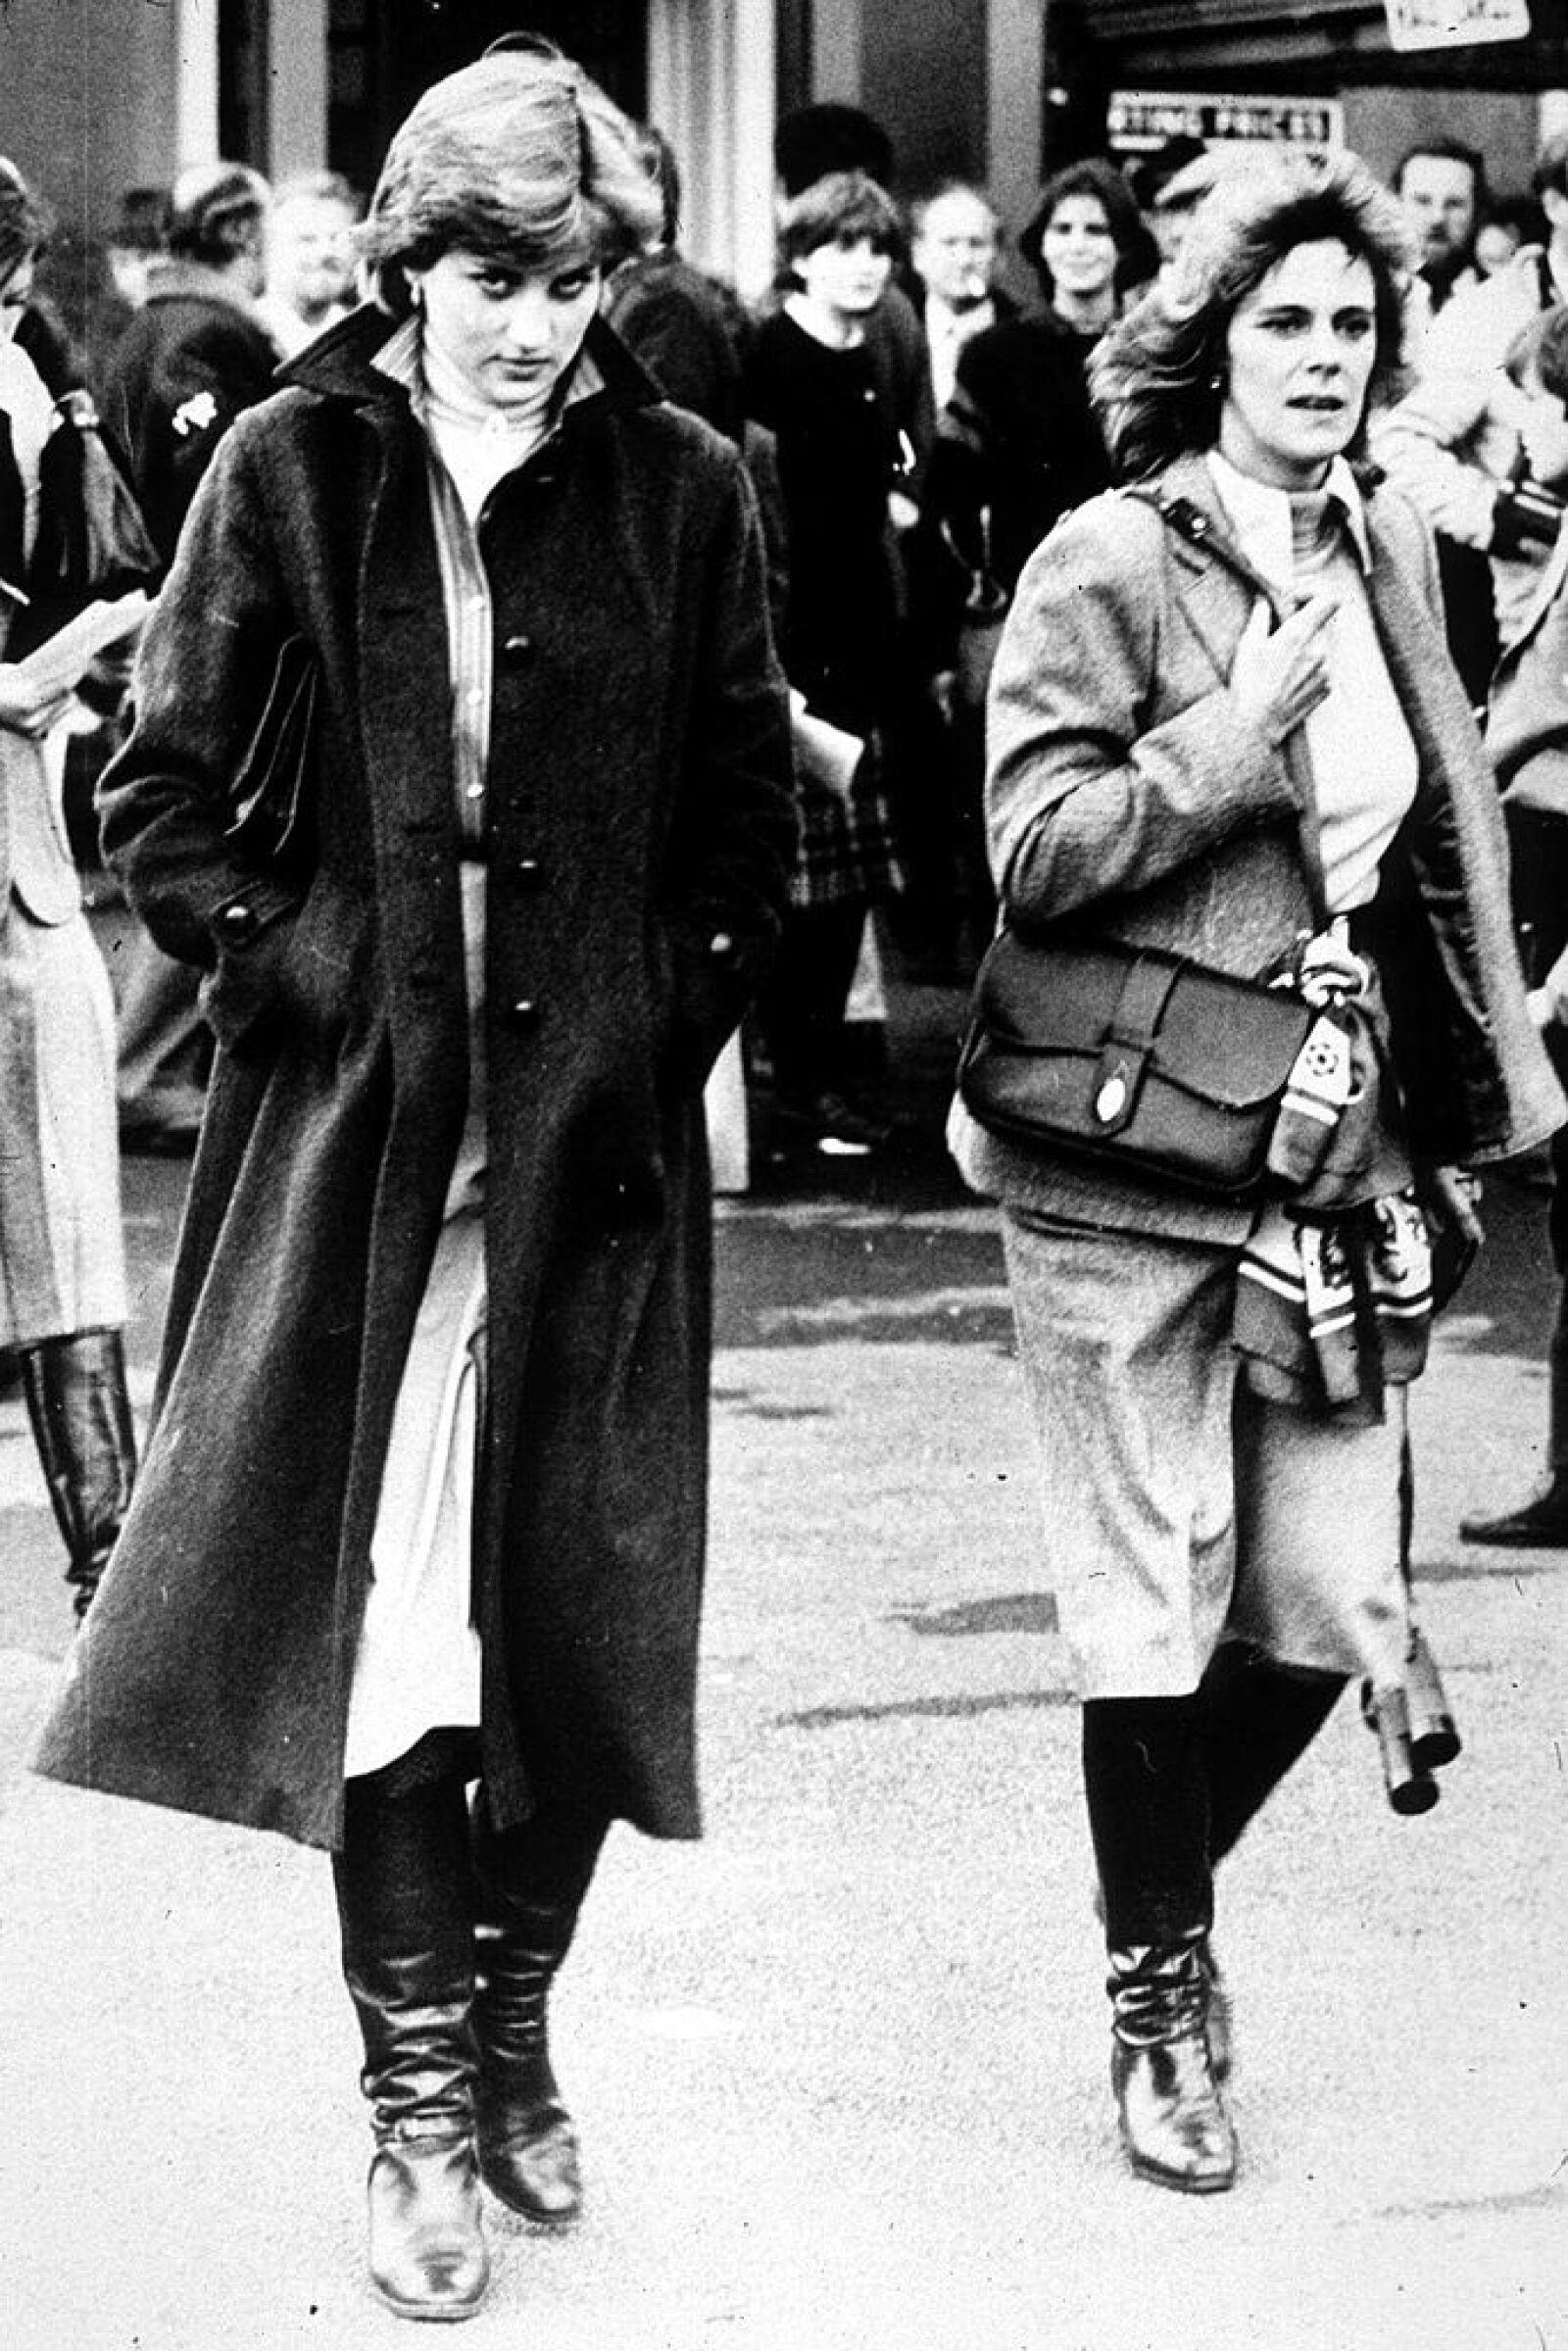 Diana & Camilla At Ludlow Races